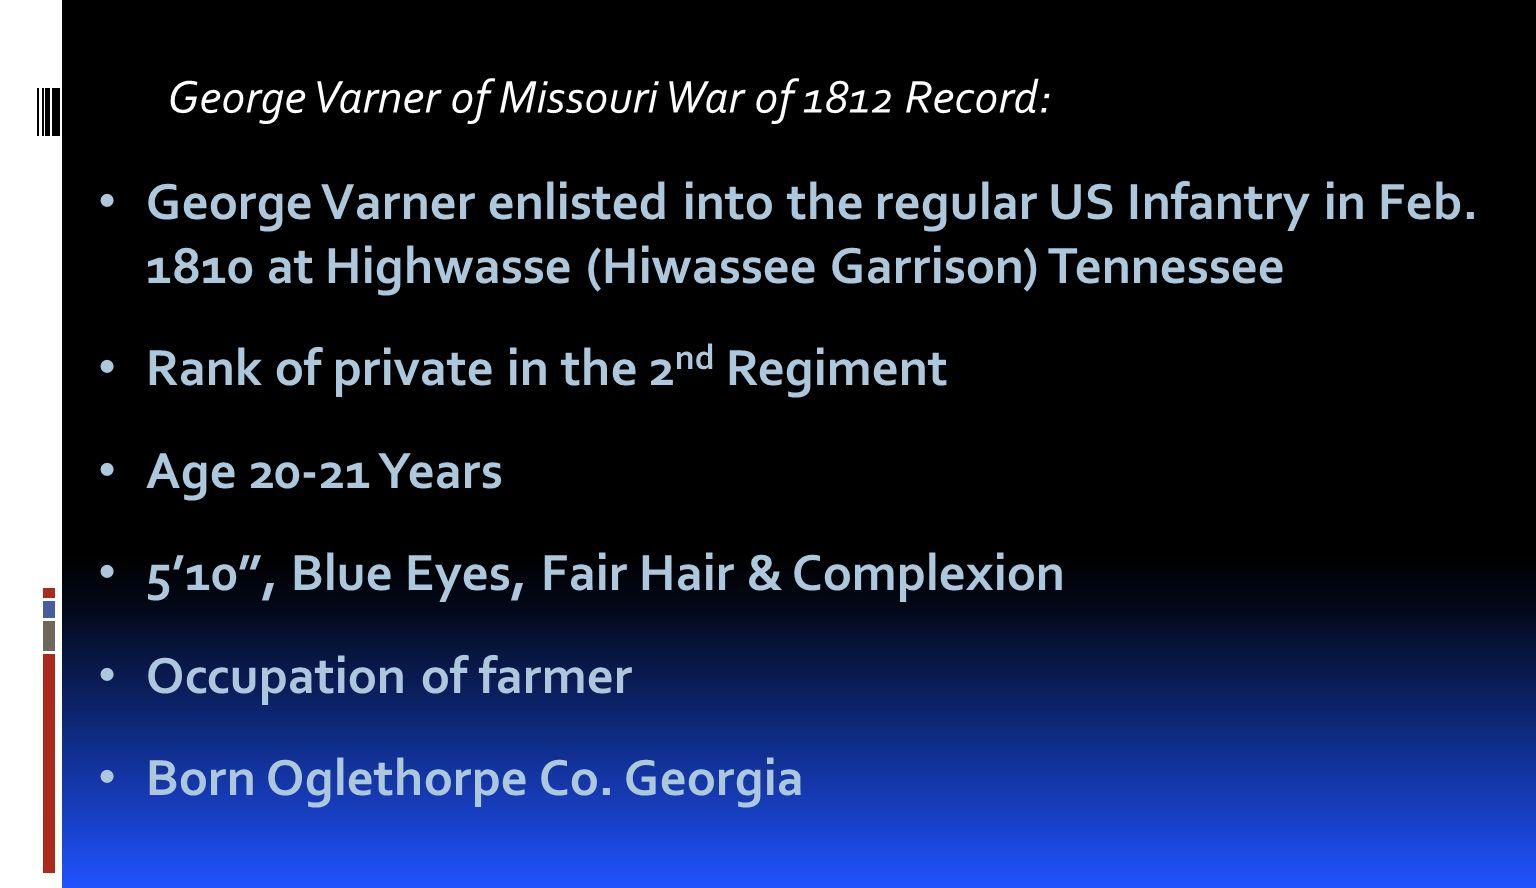 George Varner of Missouri War of 1812 Record: George Varner enlisted into the regular US Infantry in Feb.